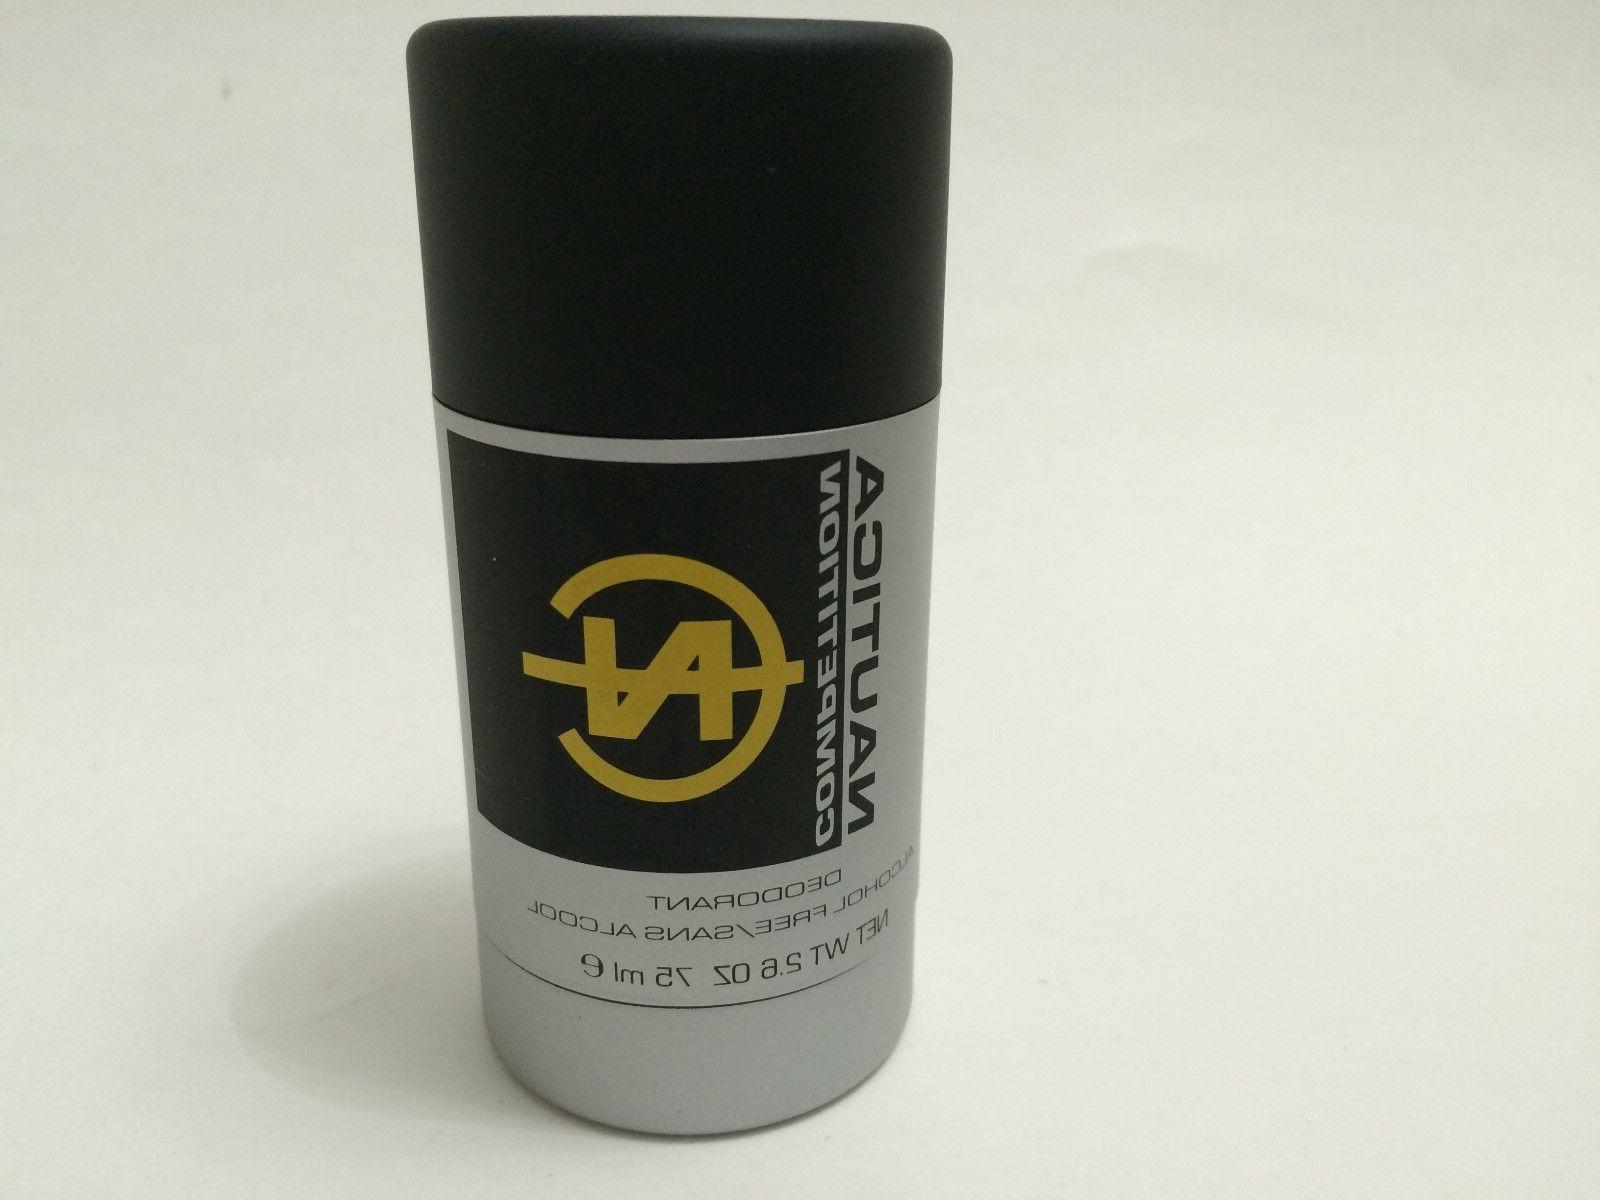 NAUTICA COMPETITION by Nautica Cologne Men Deodorant  Alcoho